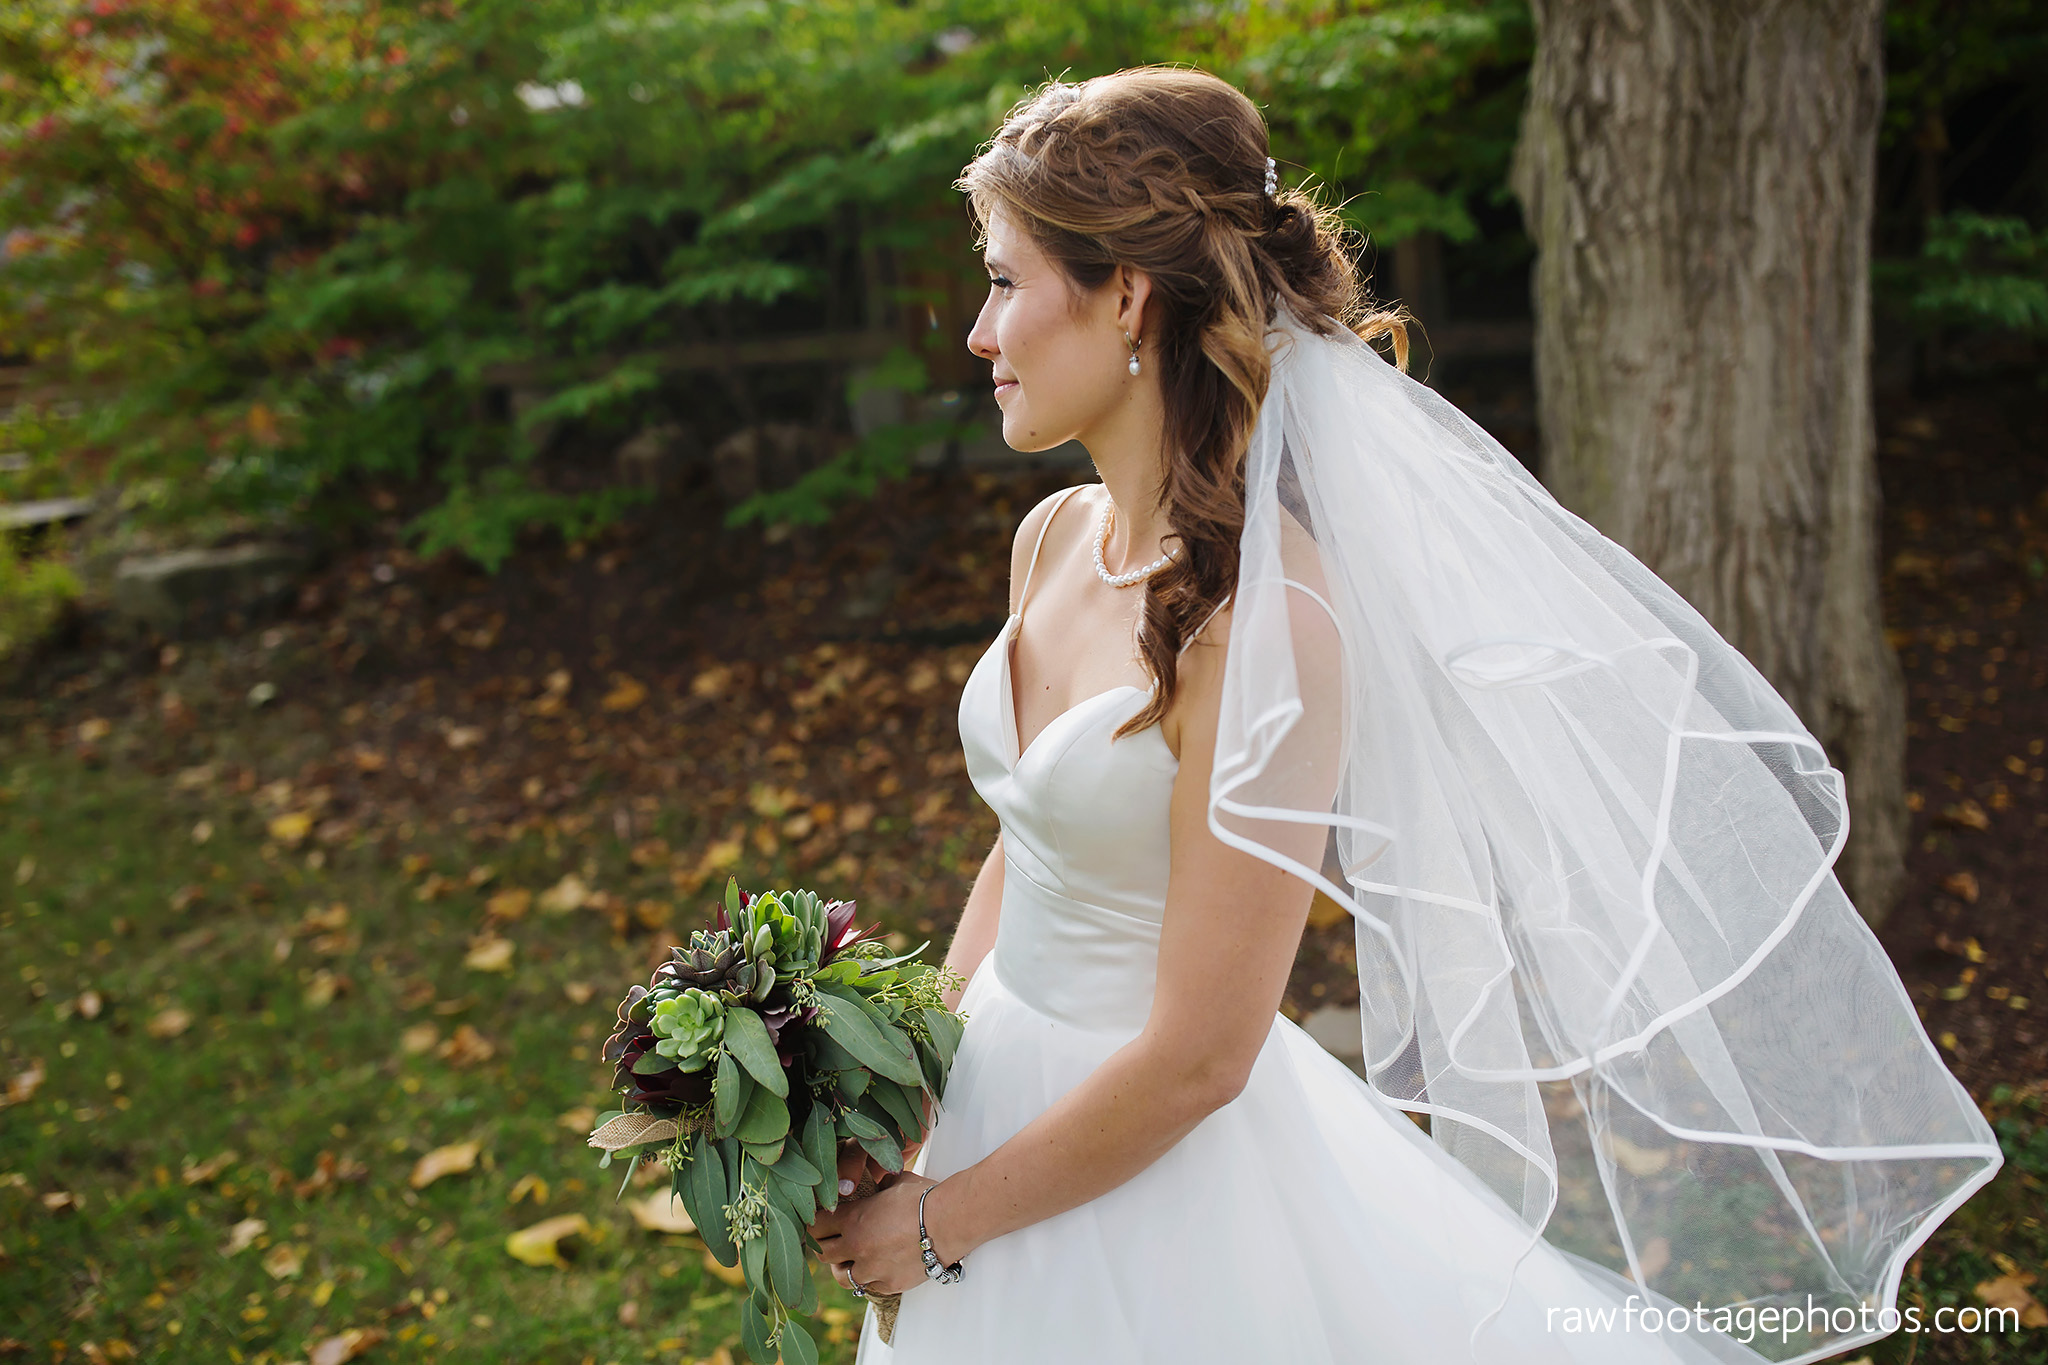 london_ontario_wedding_photographer-civic_gardens-springbank_park-succulent_bouquet-fall_wedding-bridge-raw_footage_photography019.jpg